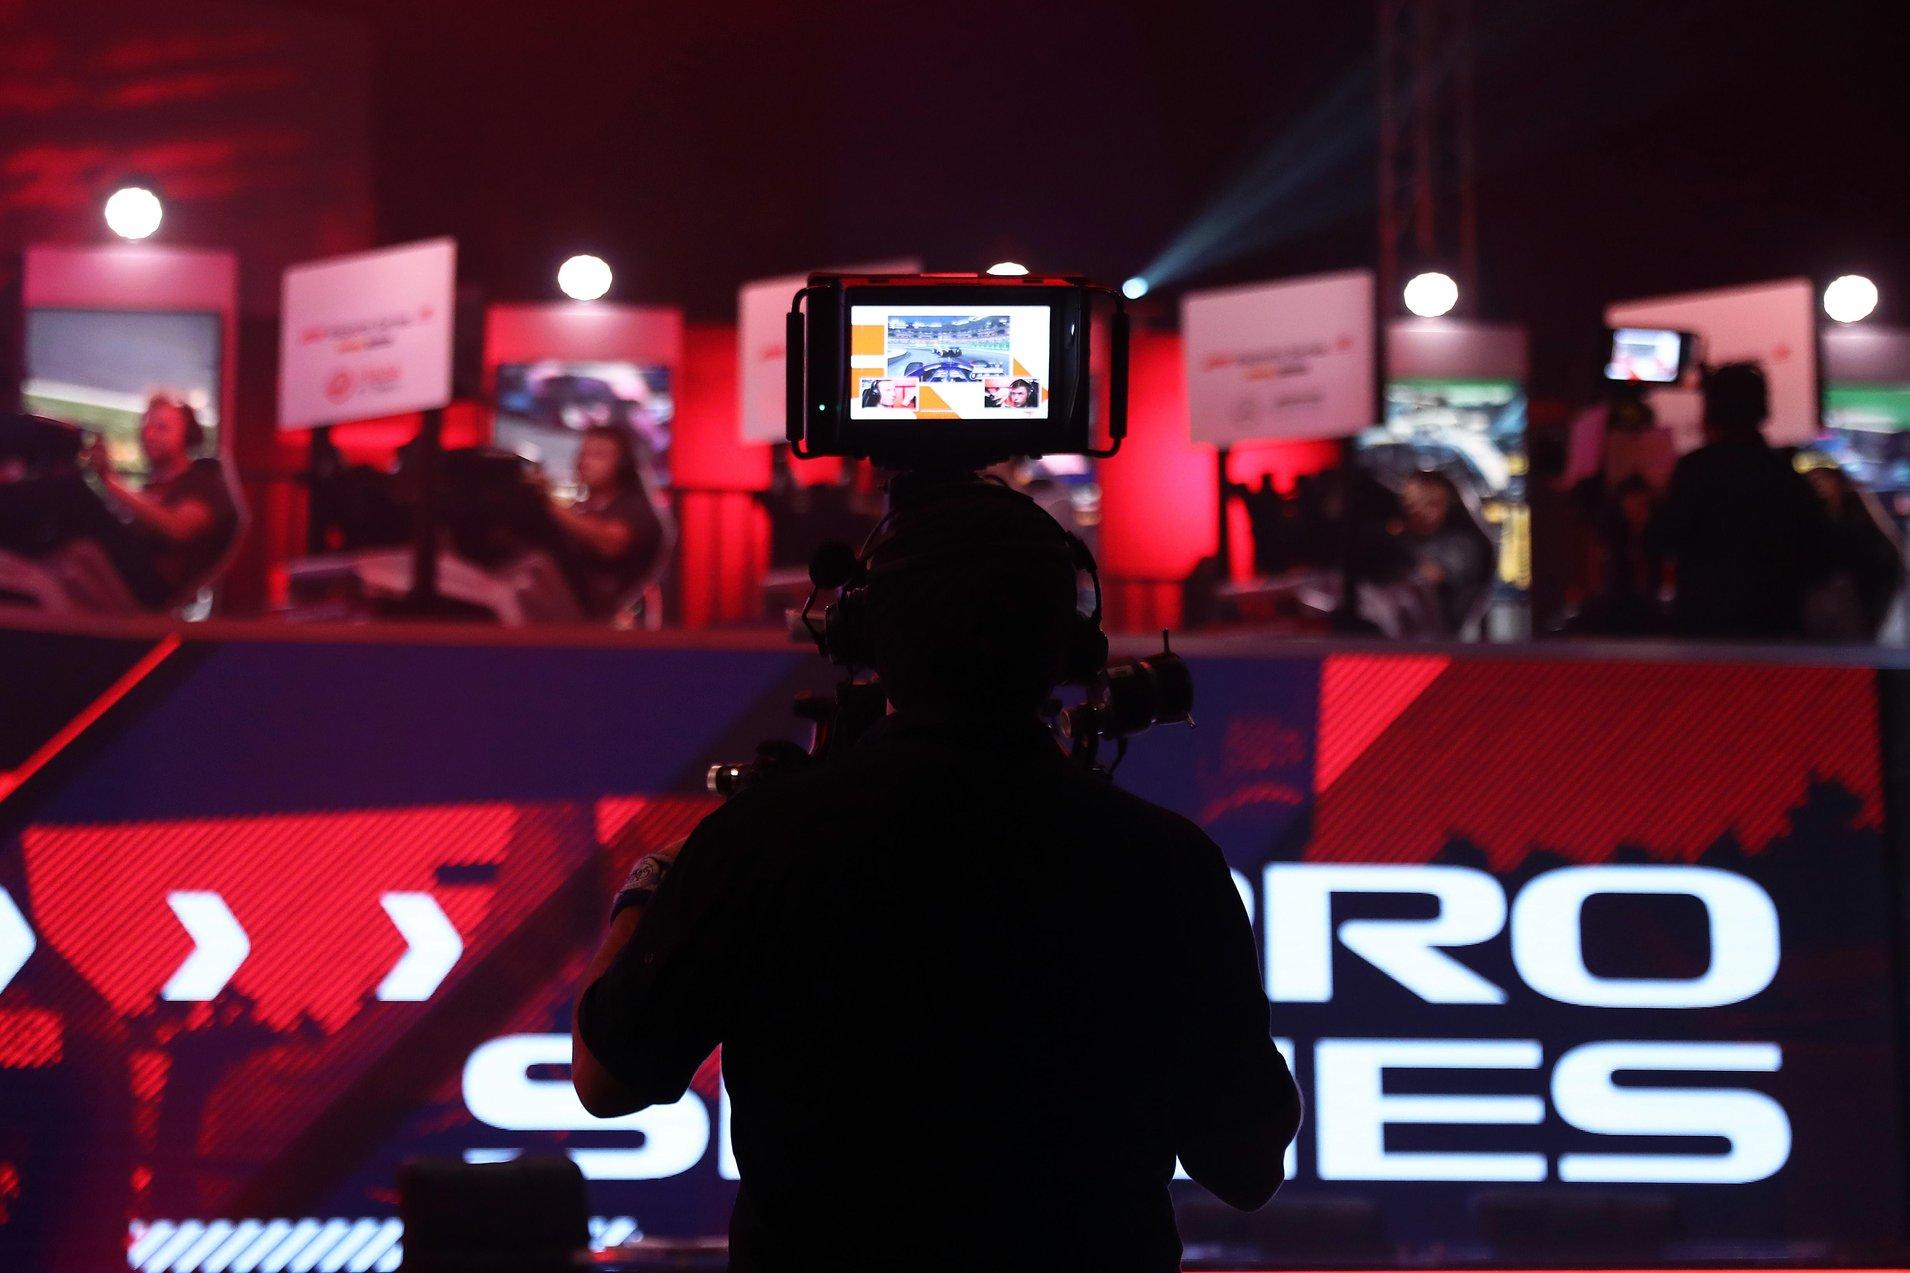 F1 Esport Series Grand Final – Gallery 5